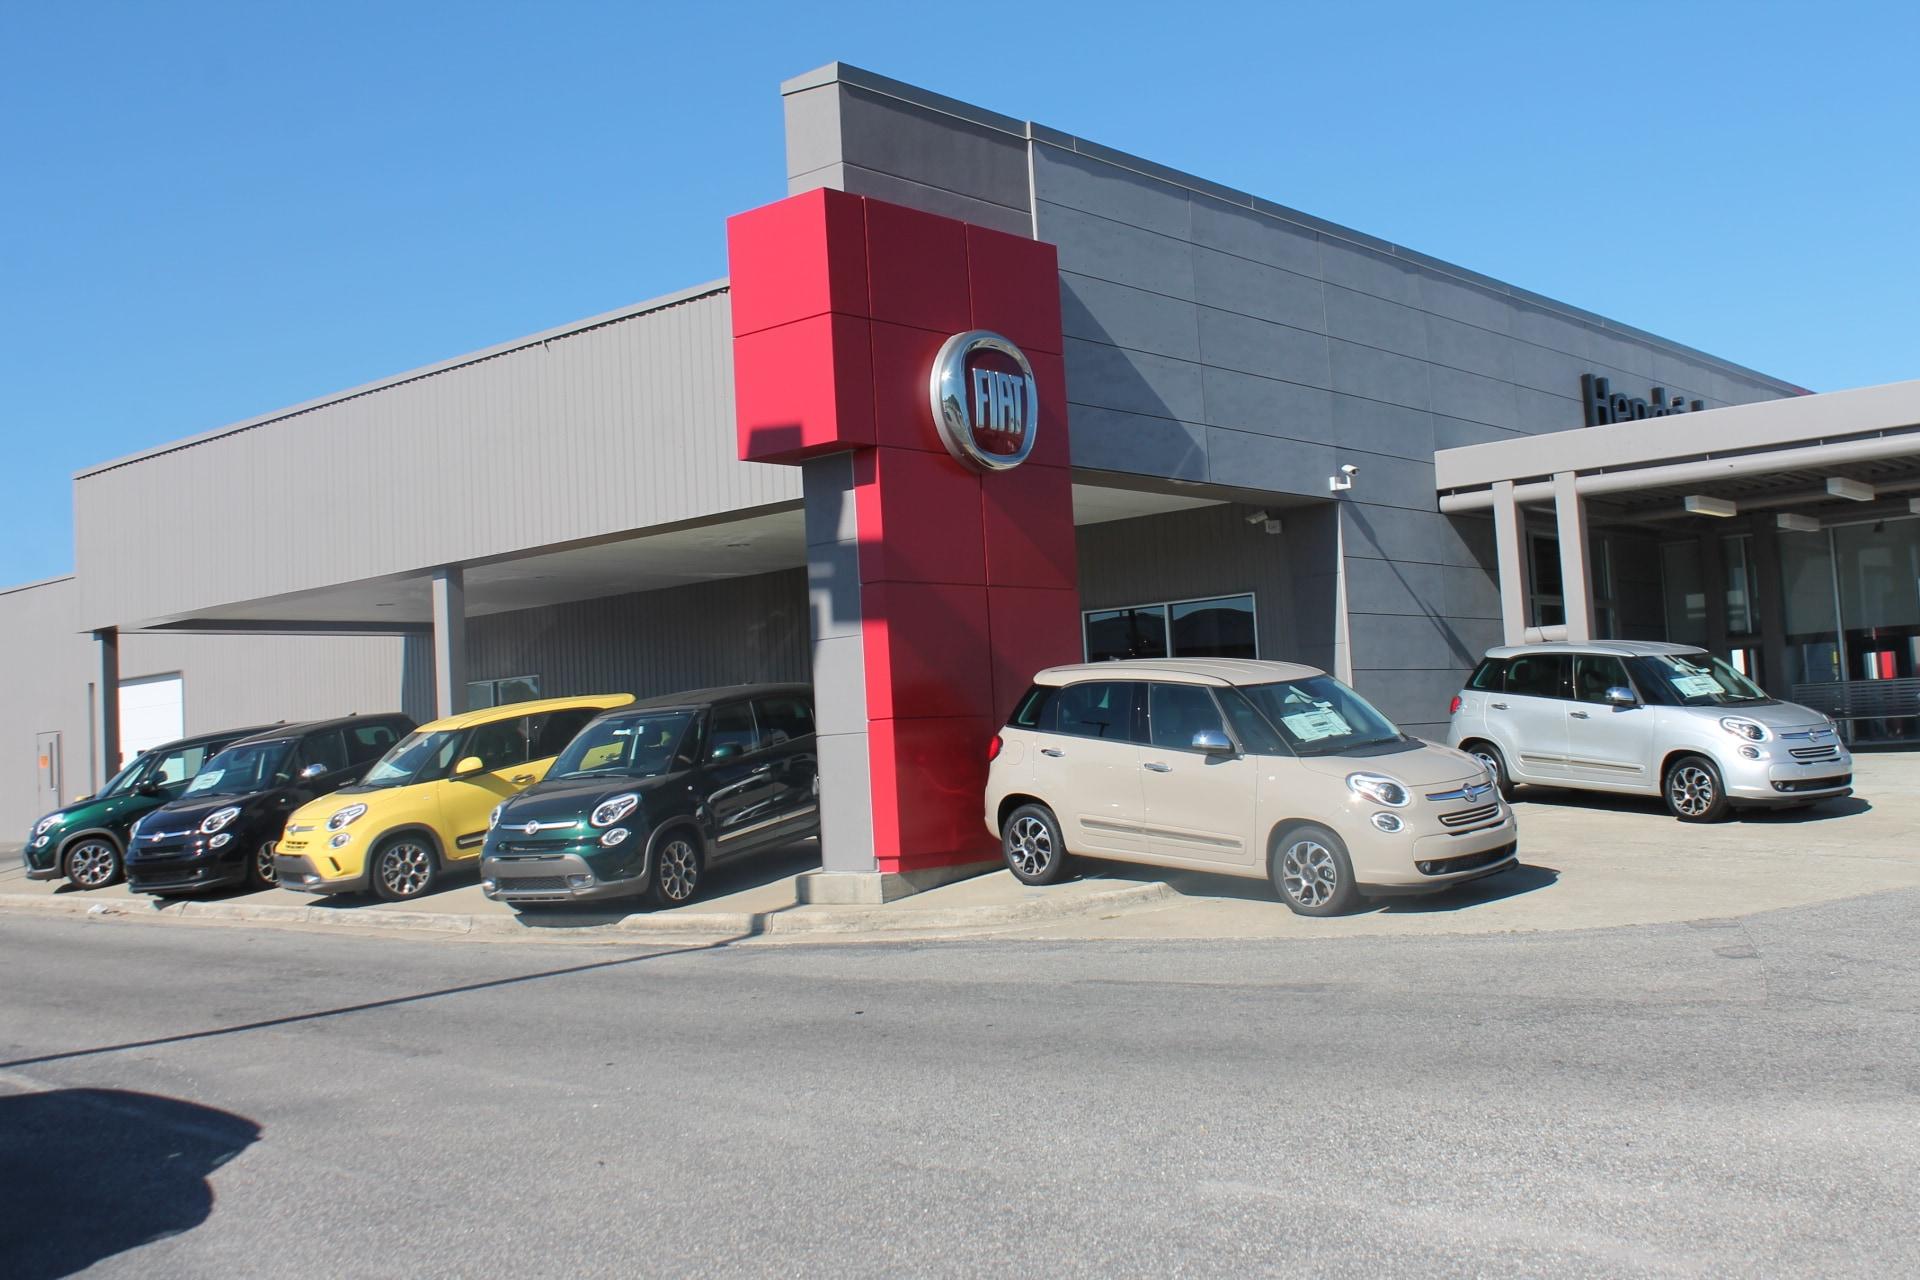 Hendrick Alfa Romeo Fiat Of Fayetteville New FIAT Dealership In - Where is the nearest fiat dealership